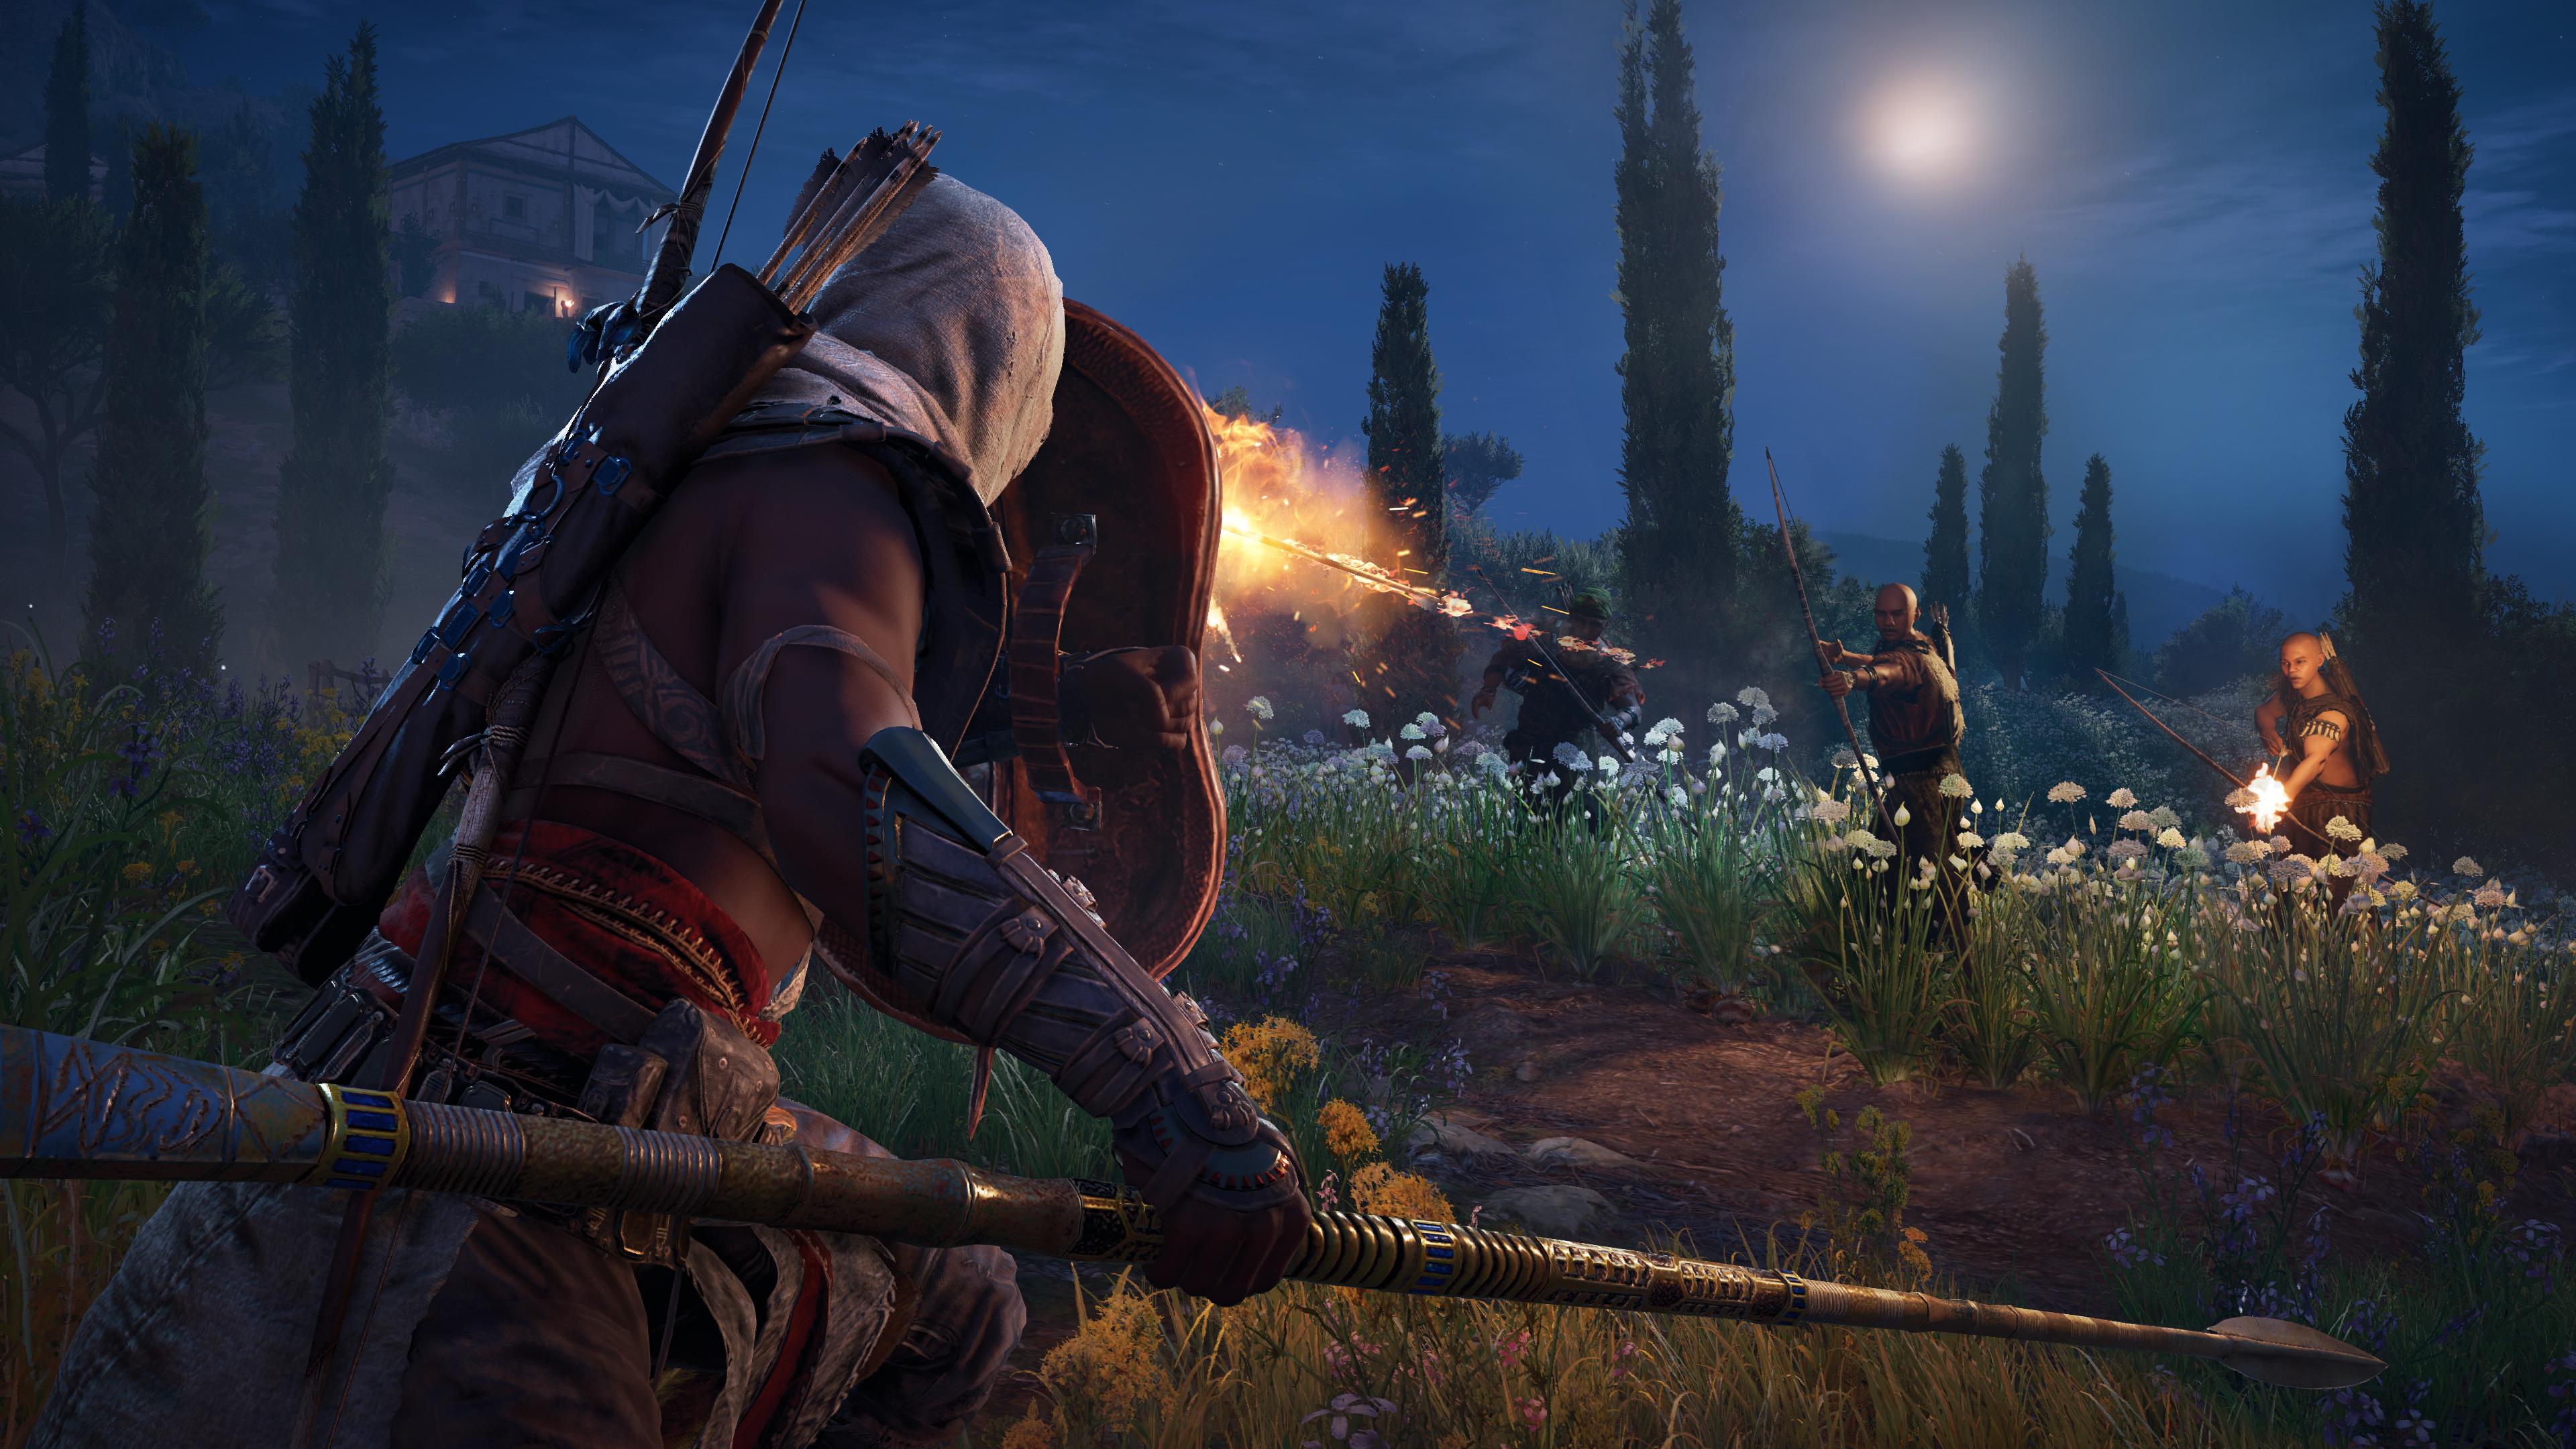 Assassin S Creed Origins New Video Showcases Combat Gameplay